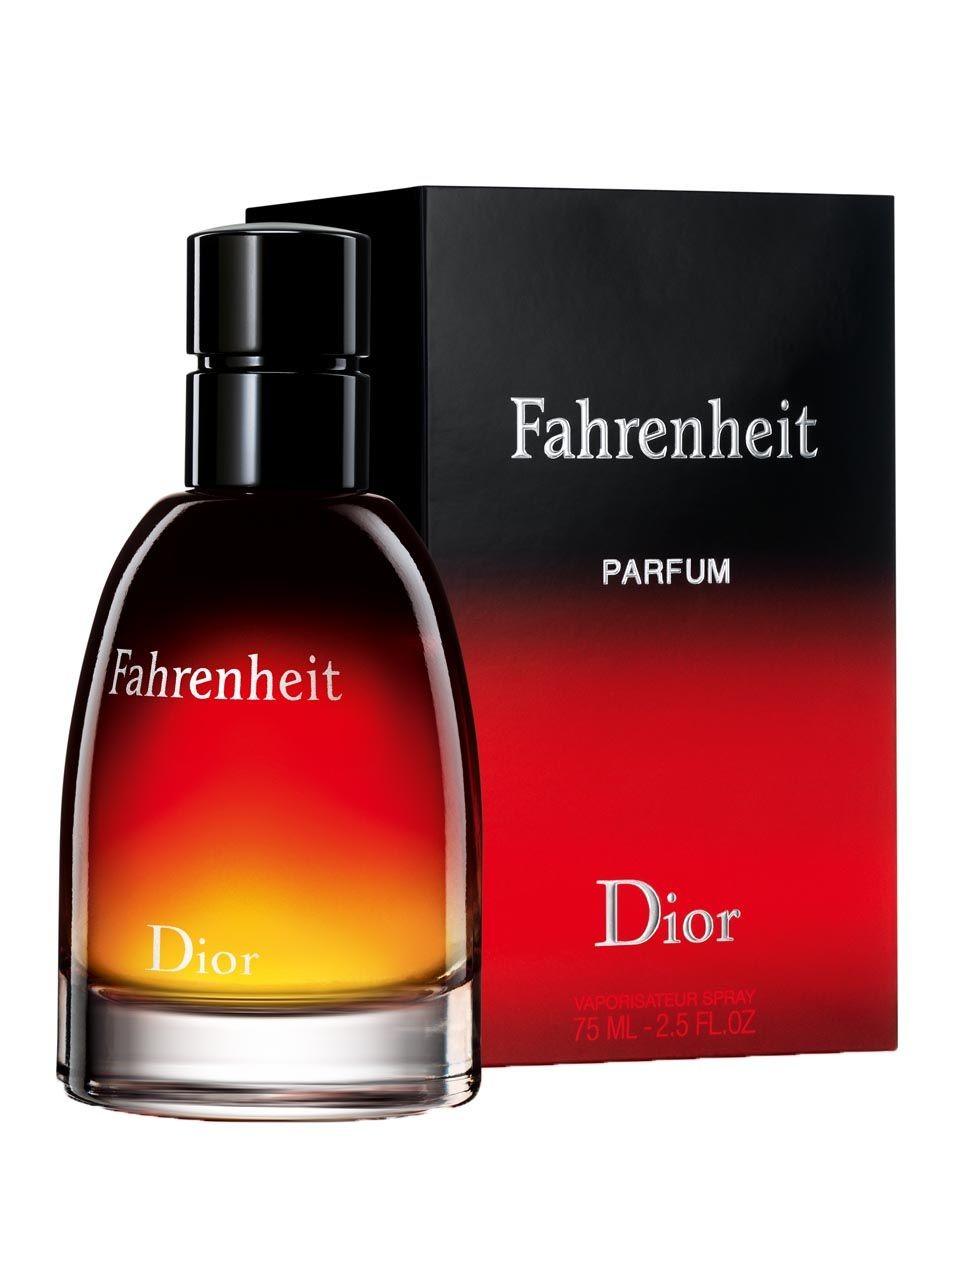 Christian Dior, FARENHEIT eau de parfum 75 ml vapo.